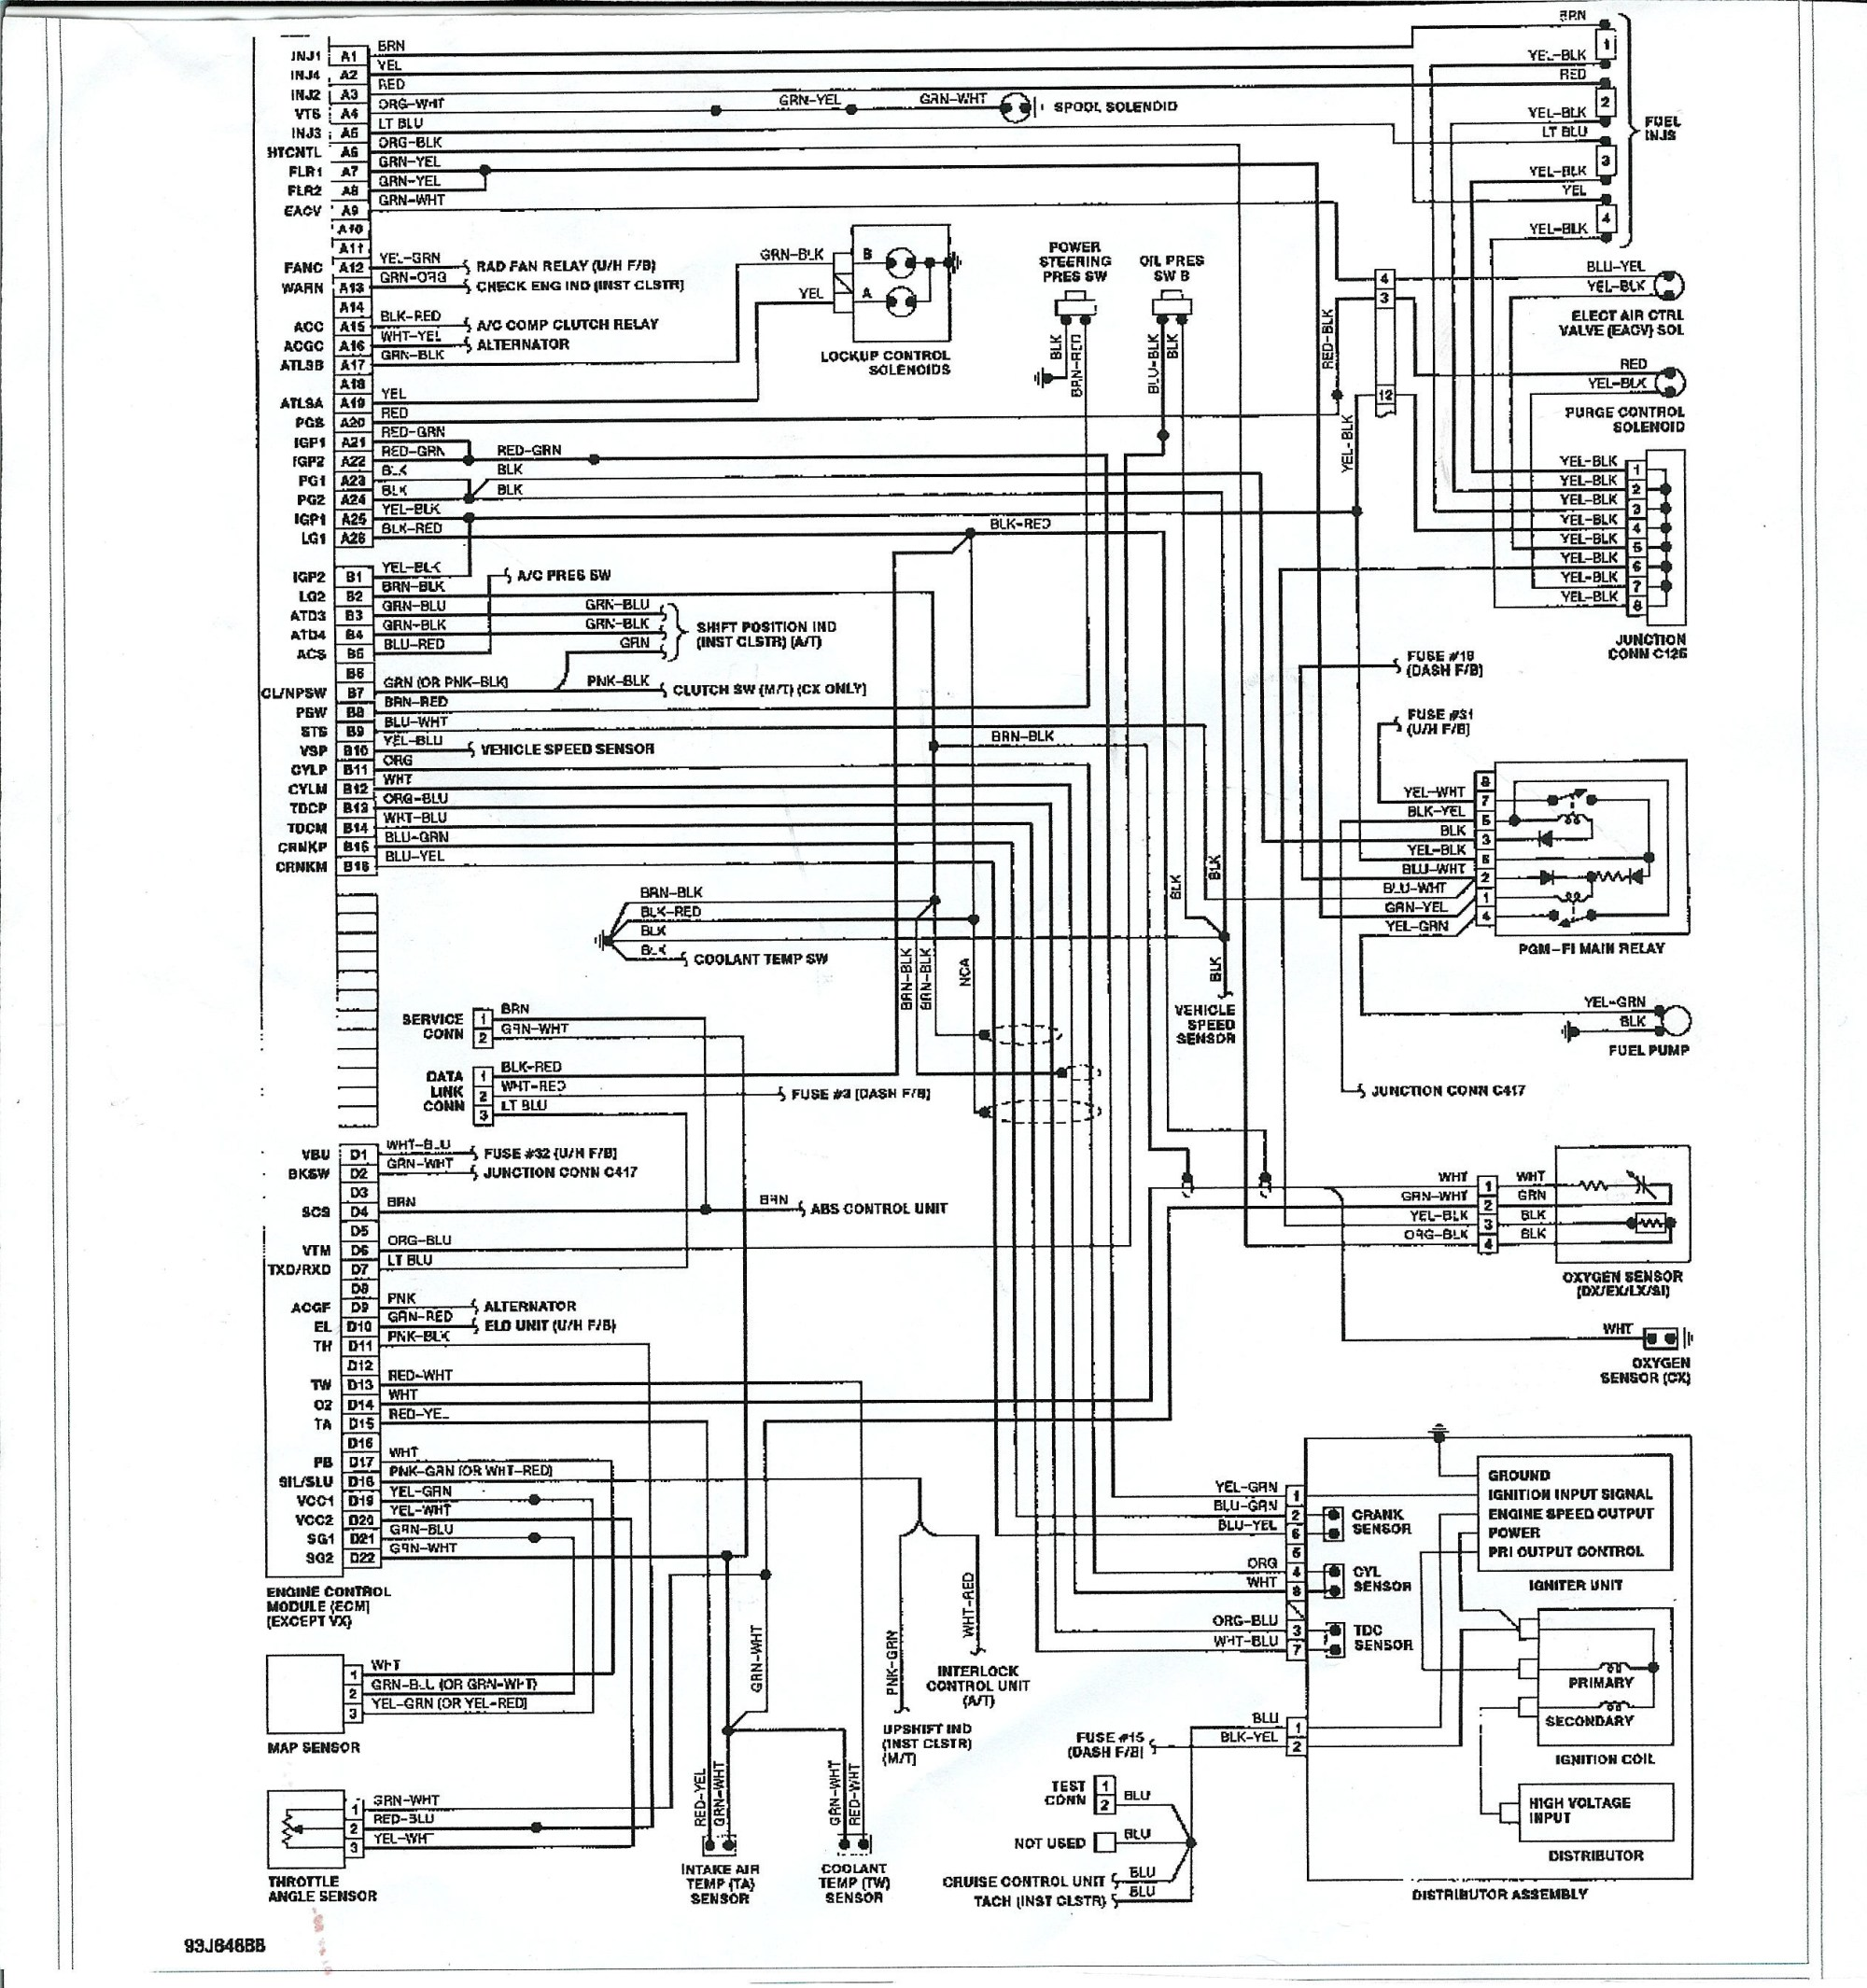 hight resolution of 1997 honda accord engine diagram vw transporter wiring diagram 95 honda civic transmission diagram of 1997